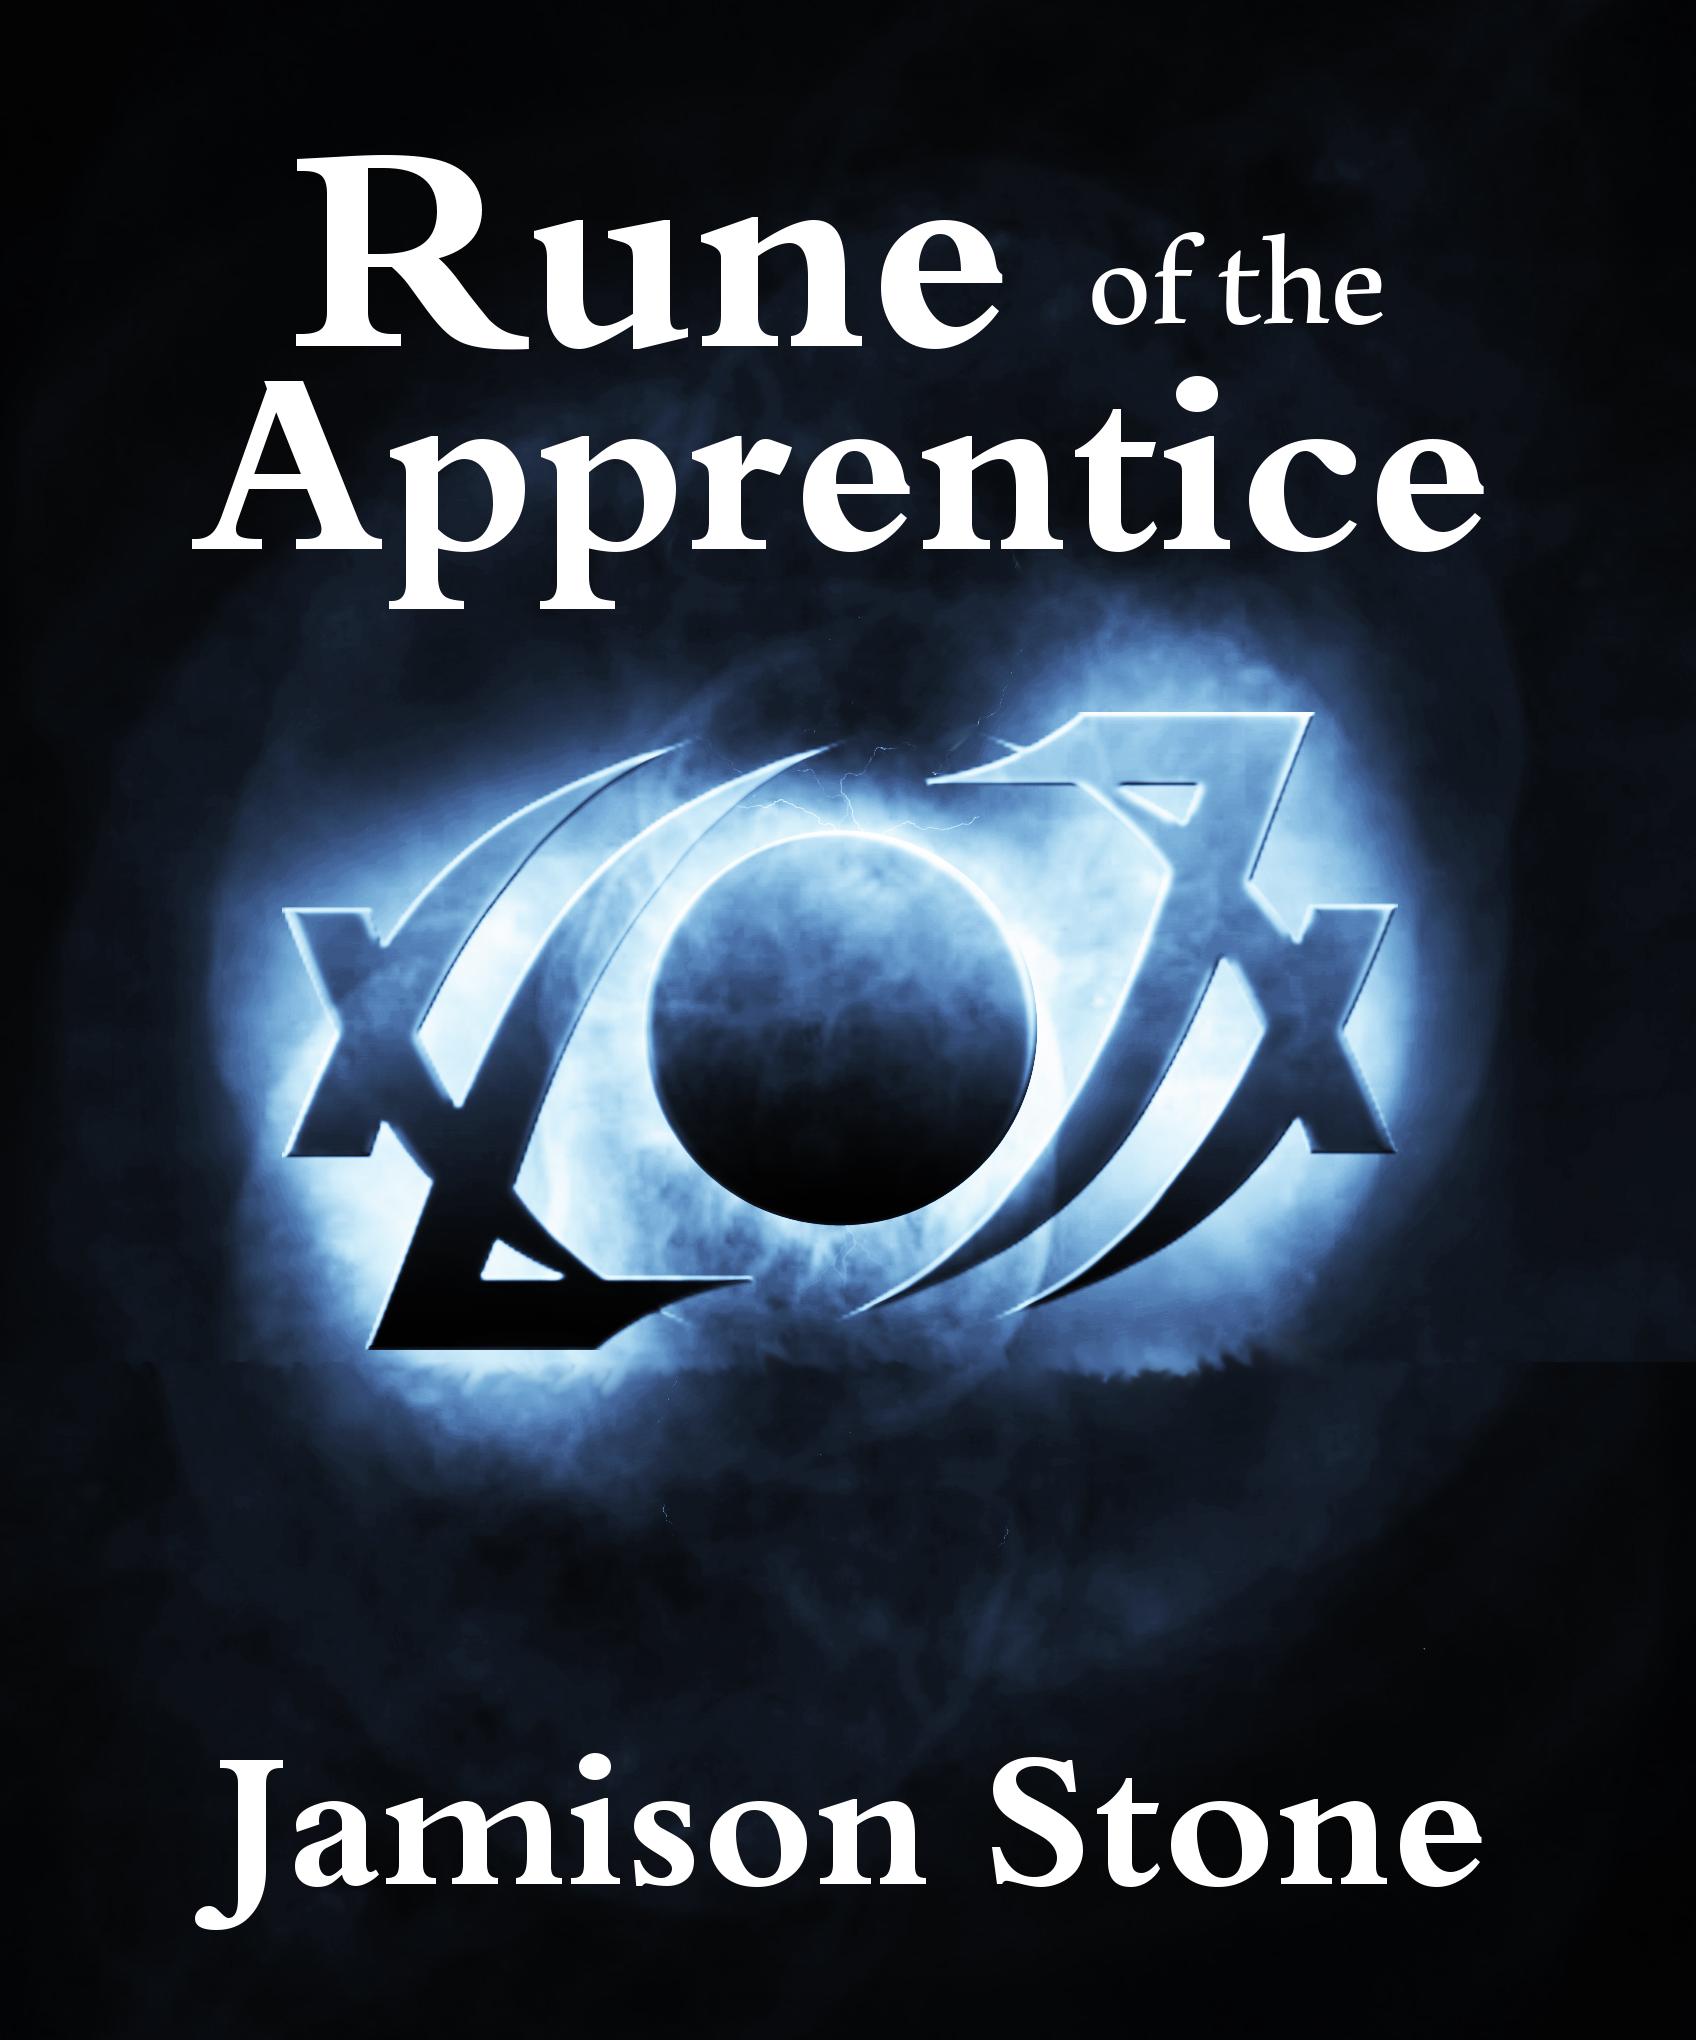 Rune_of_the_Apprentice